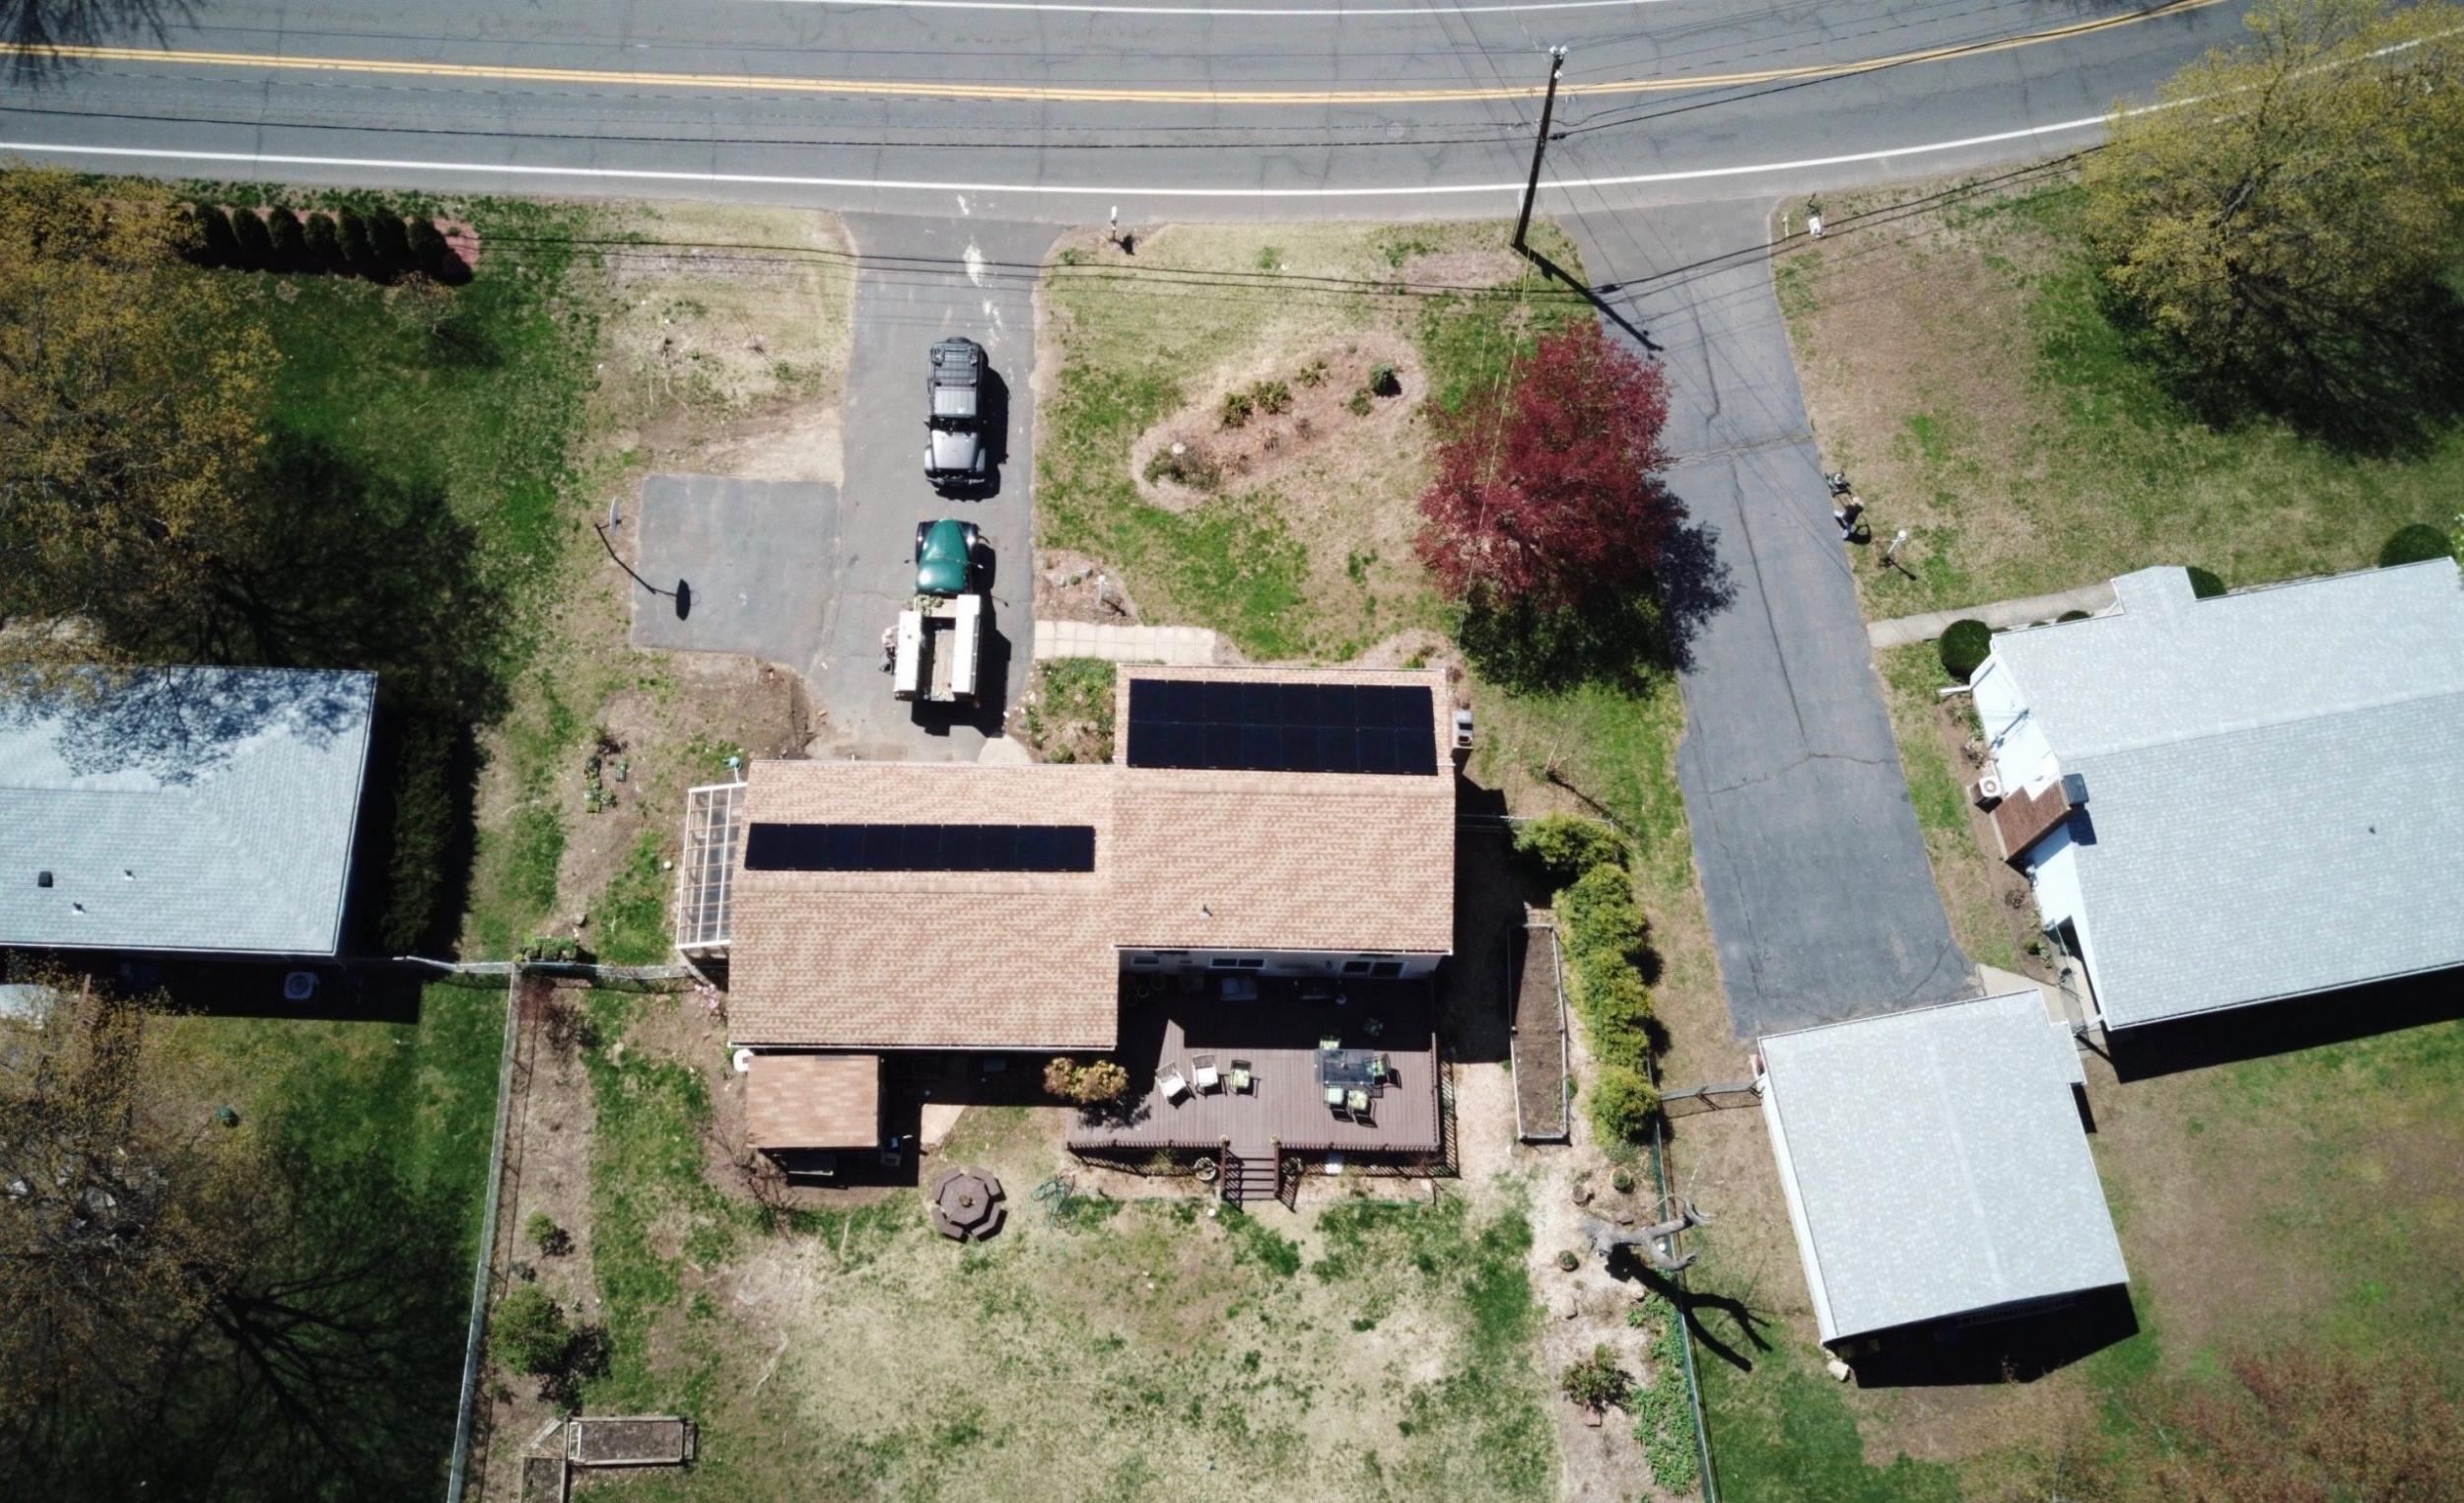 SunPower SAVKAT roof installation solar pV system